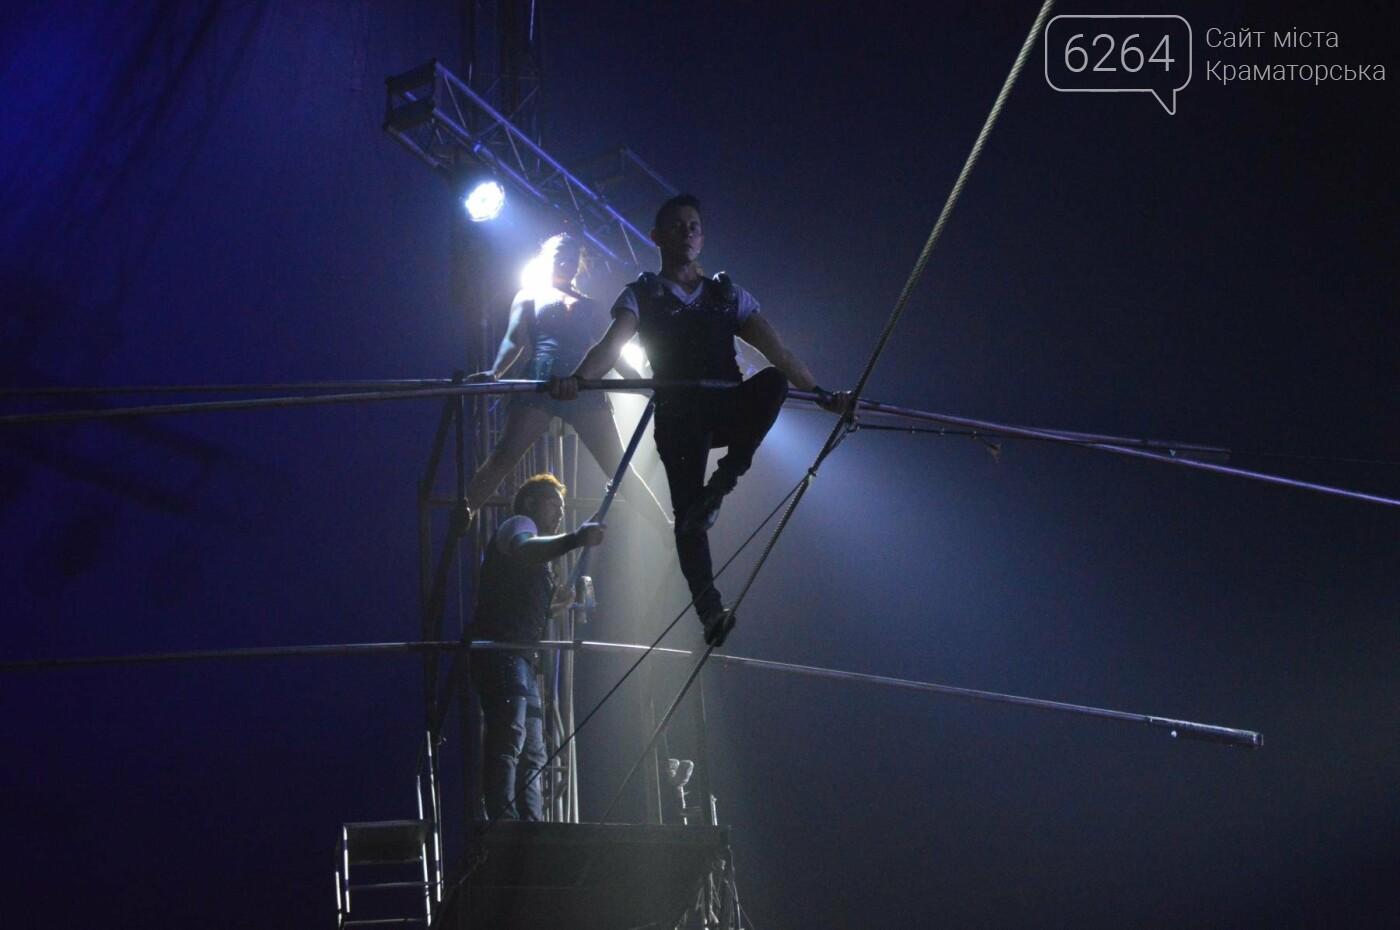 Новое шоу цирка «Кобзов» произвело фурор в Краматорске, фото-12